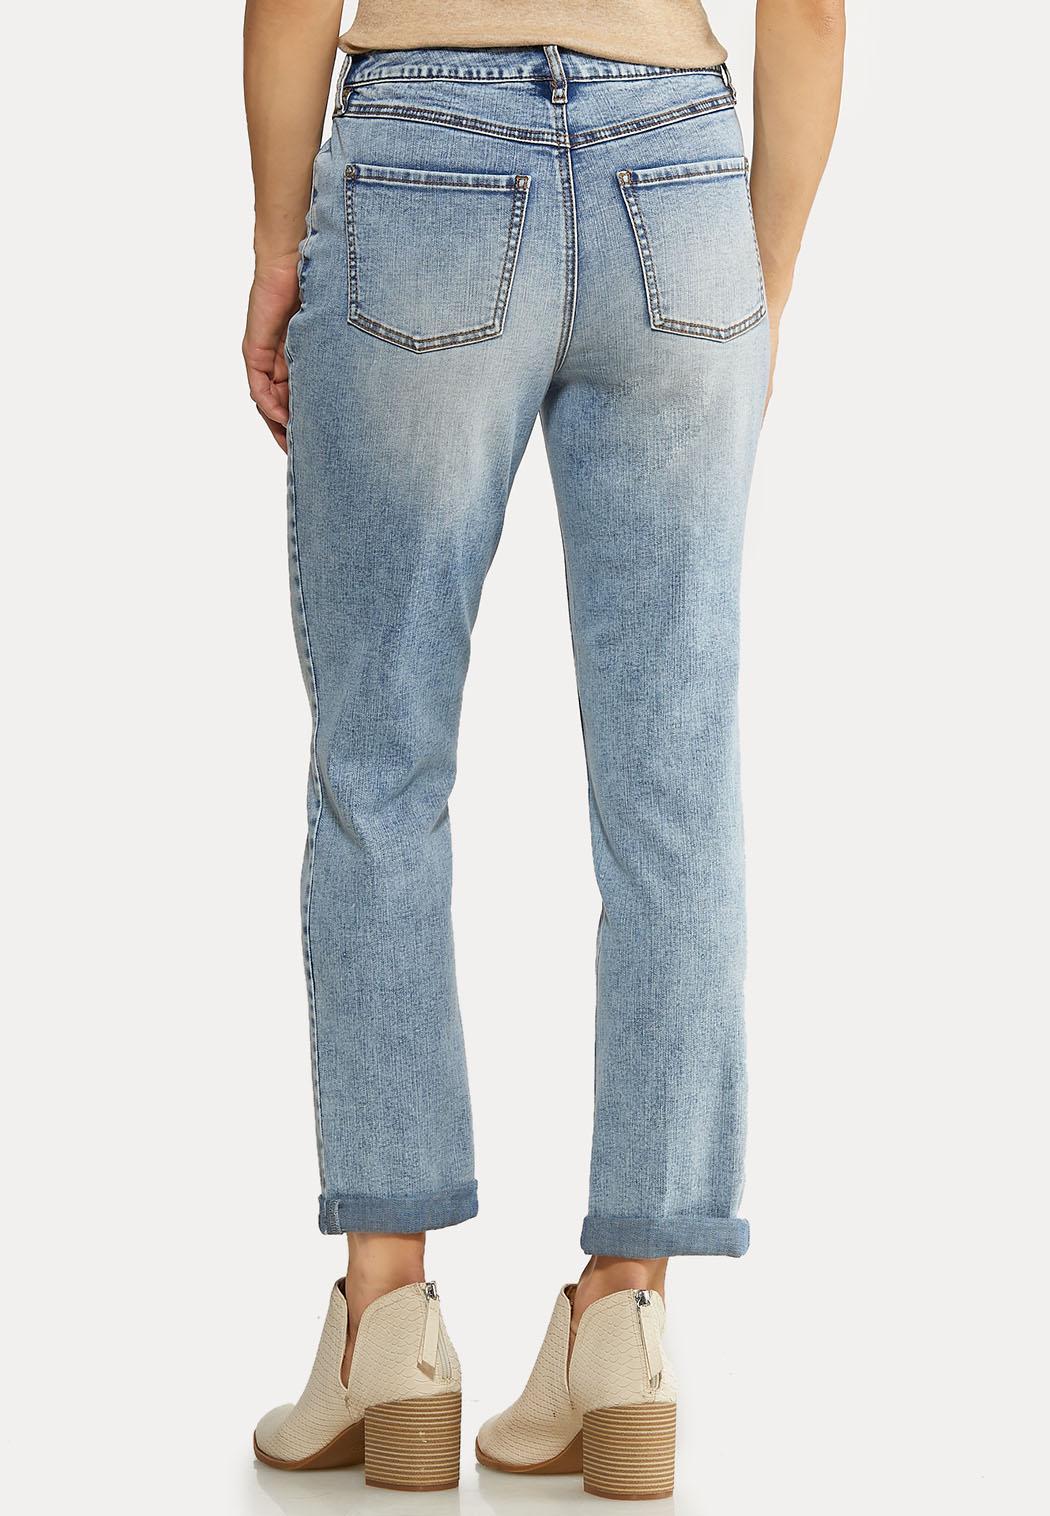 Slim Boyfriend Jeans (Item #44065167)